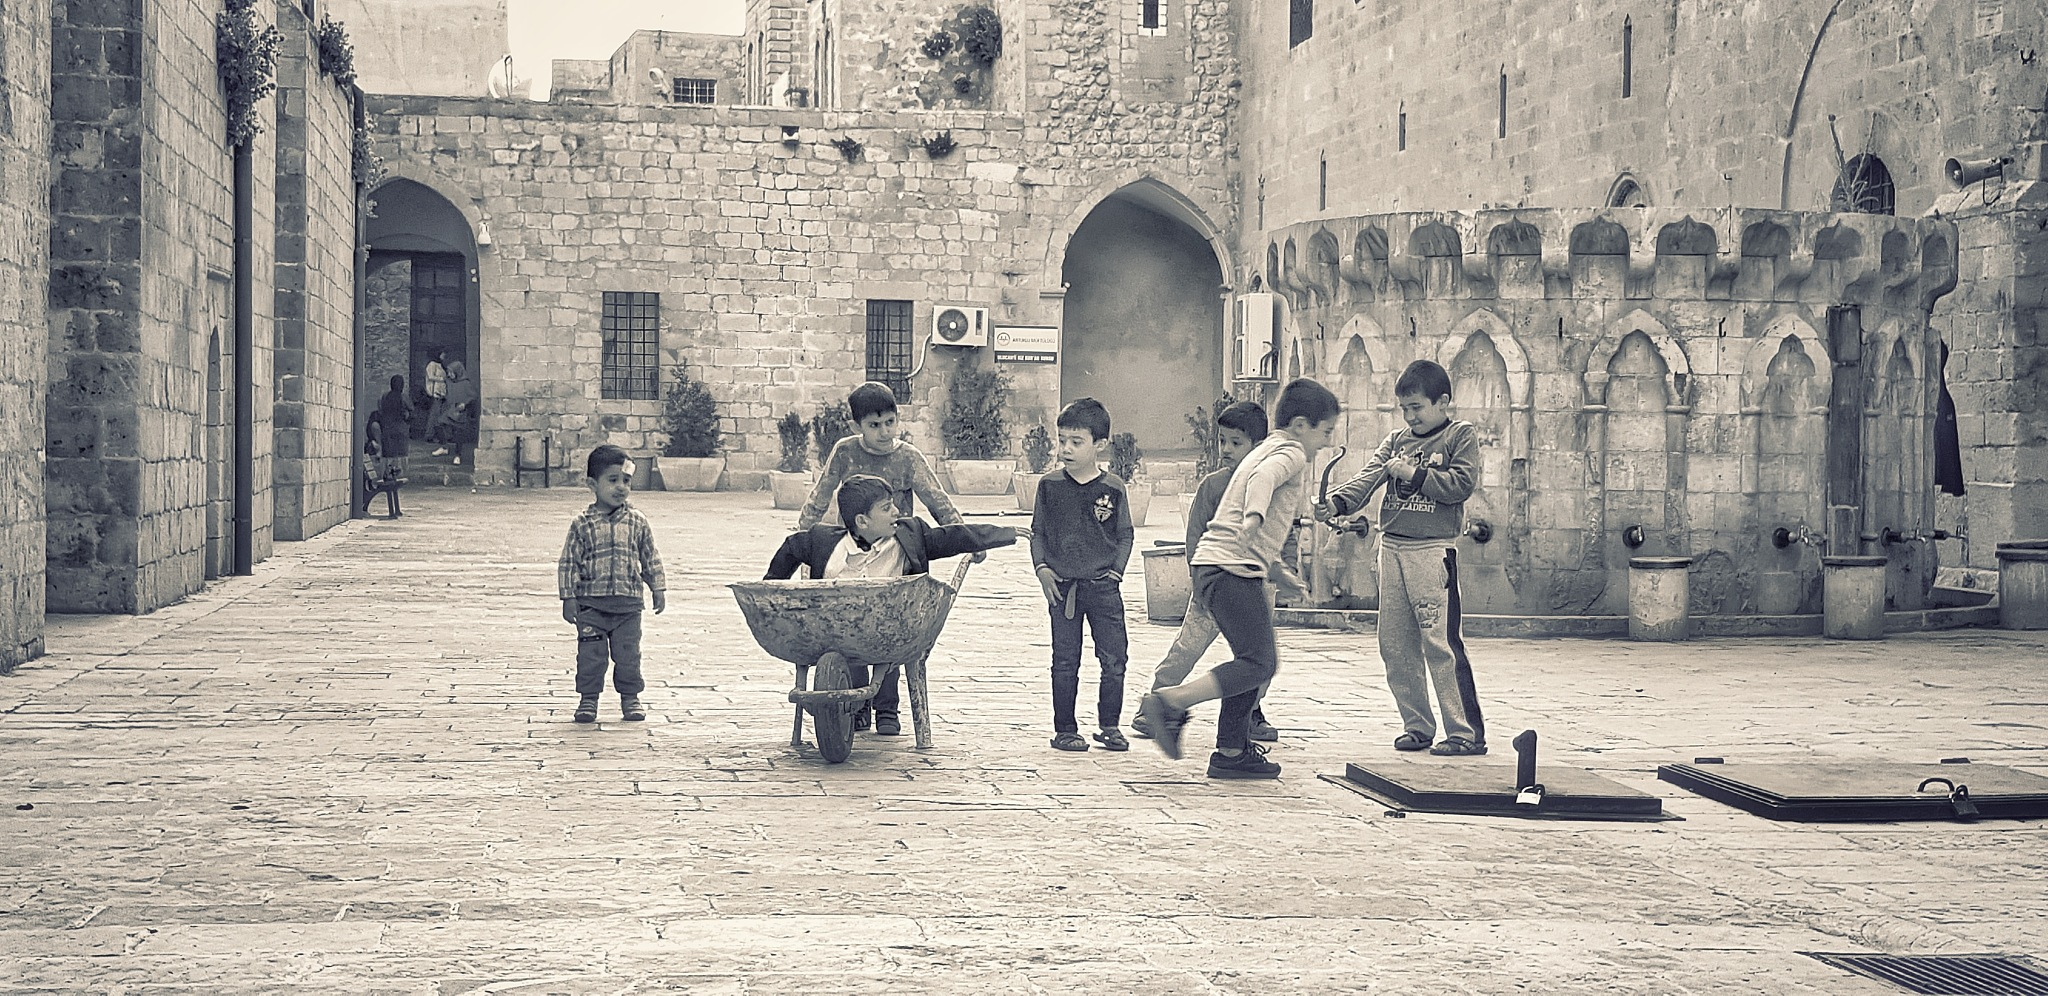 Children of Men by Meriç Aksu